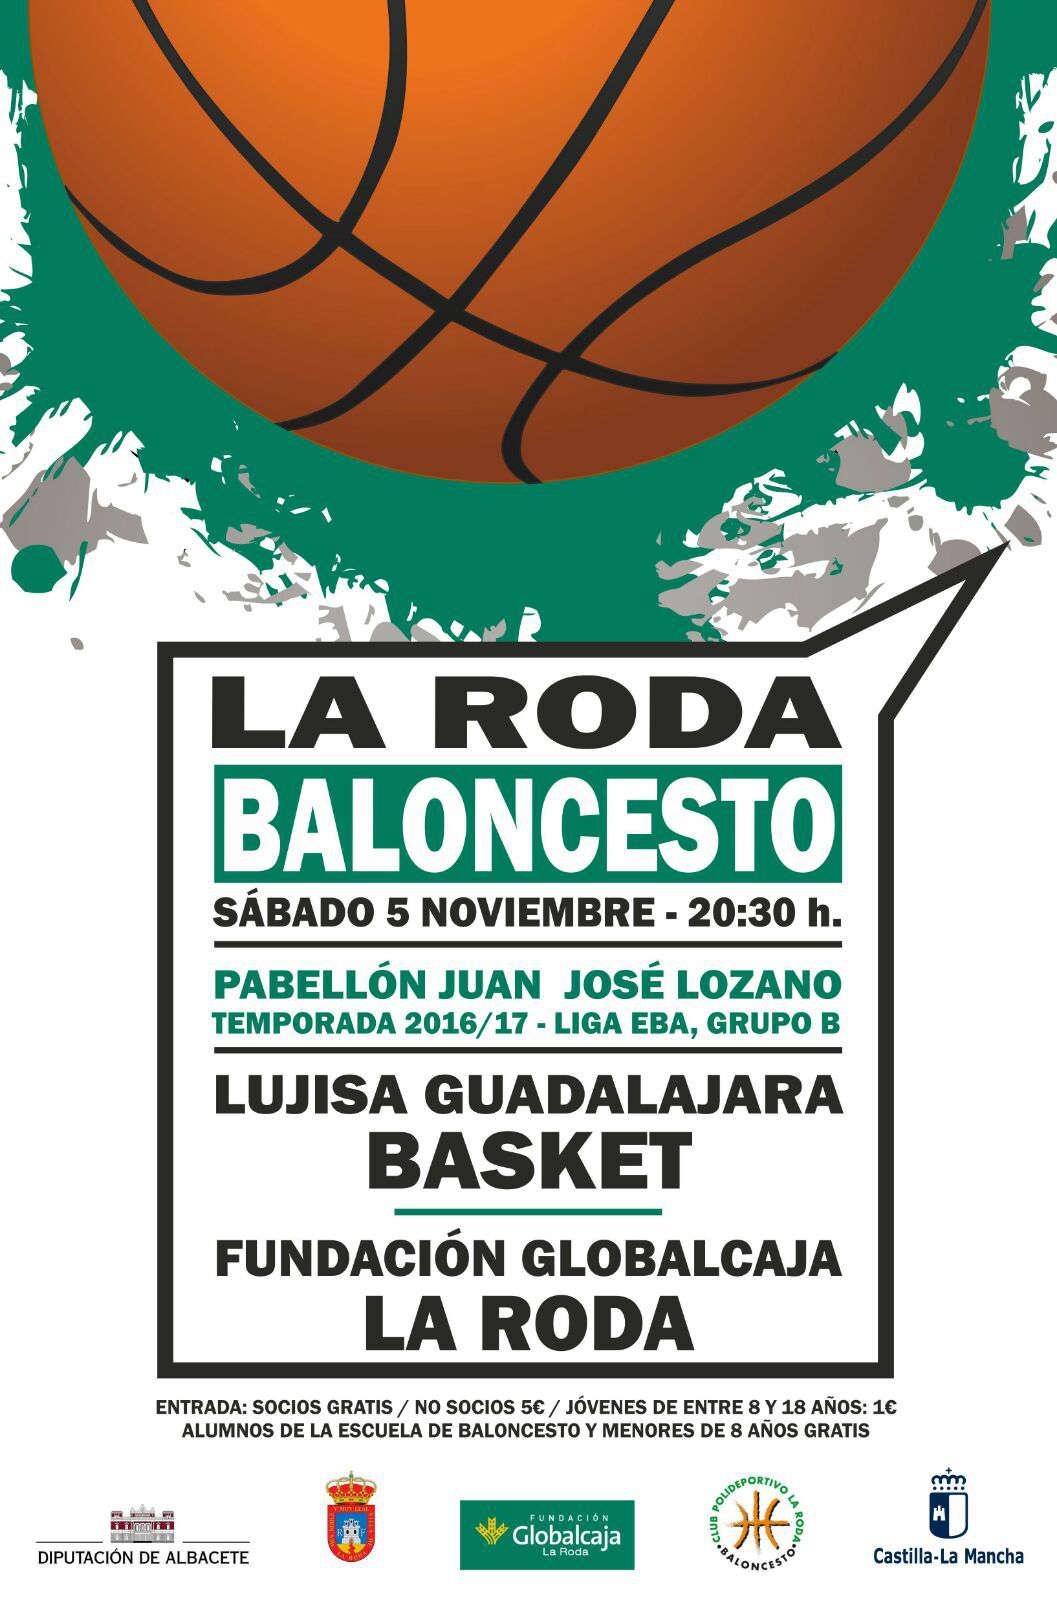 Cartel Fundación Globalcaja La Roda - Lujisa Guadalajara Basket